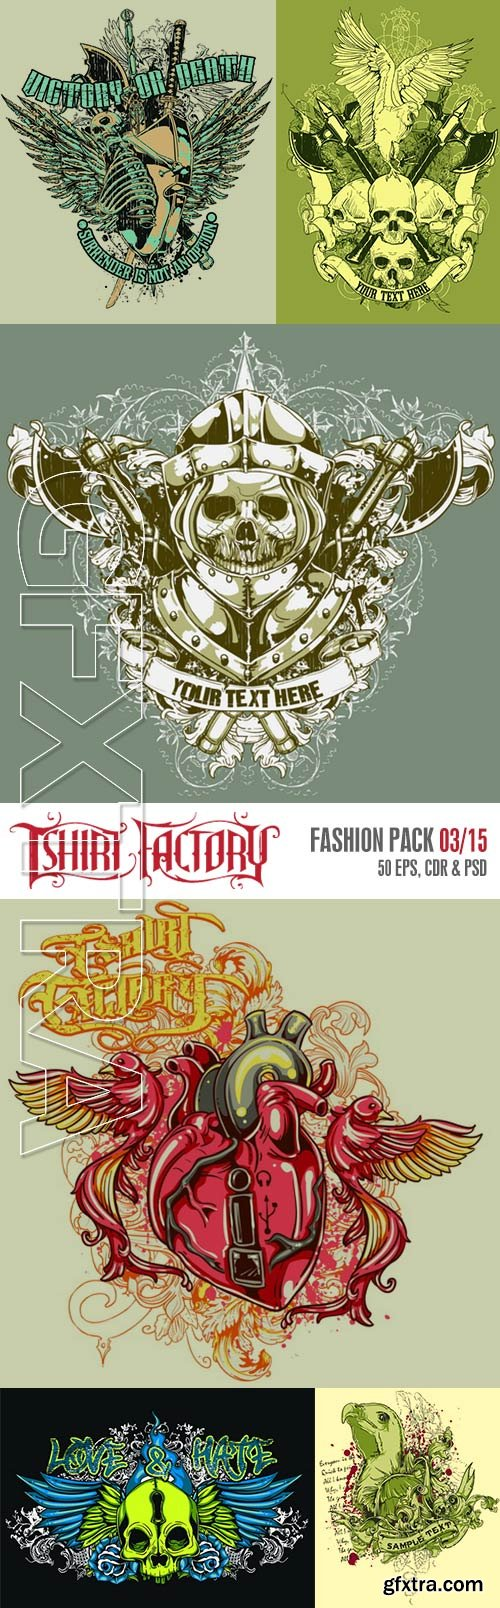 T-Shirt Factory - Fashion Pack 03/15